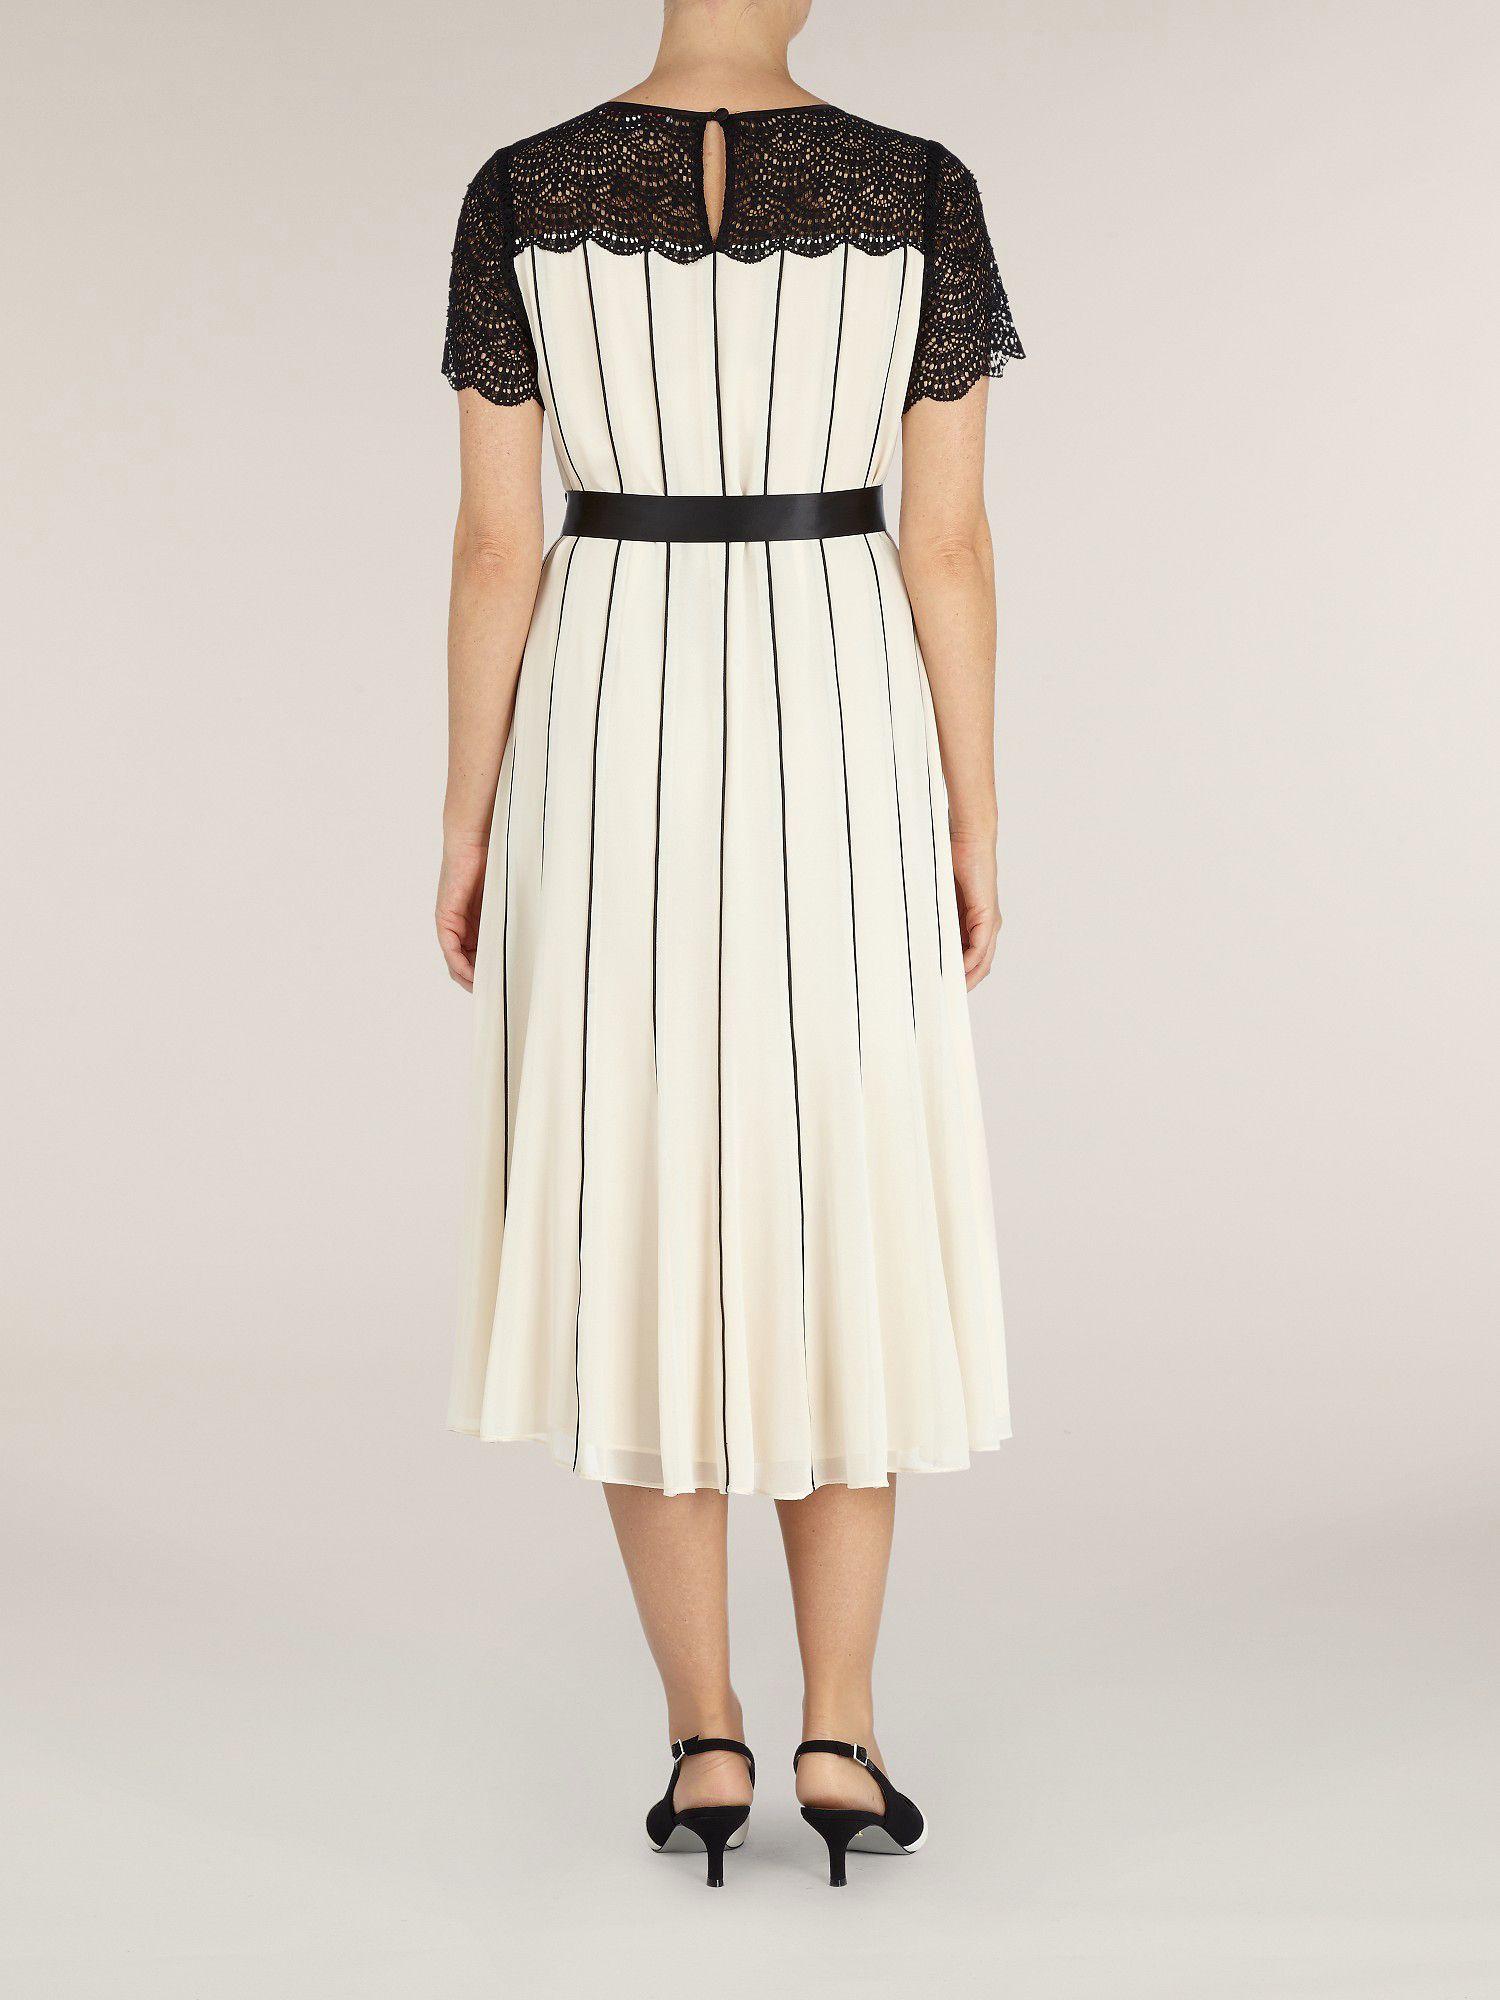 Lyst Jacques Vert Chiffon Dress In Natural